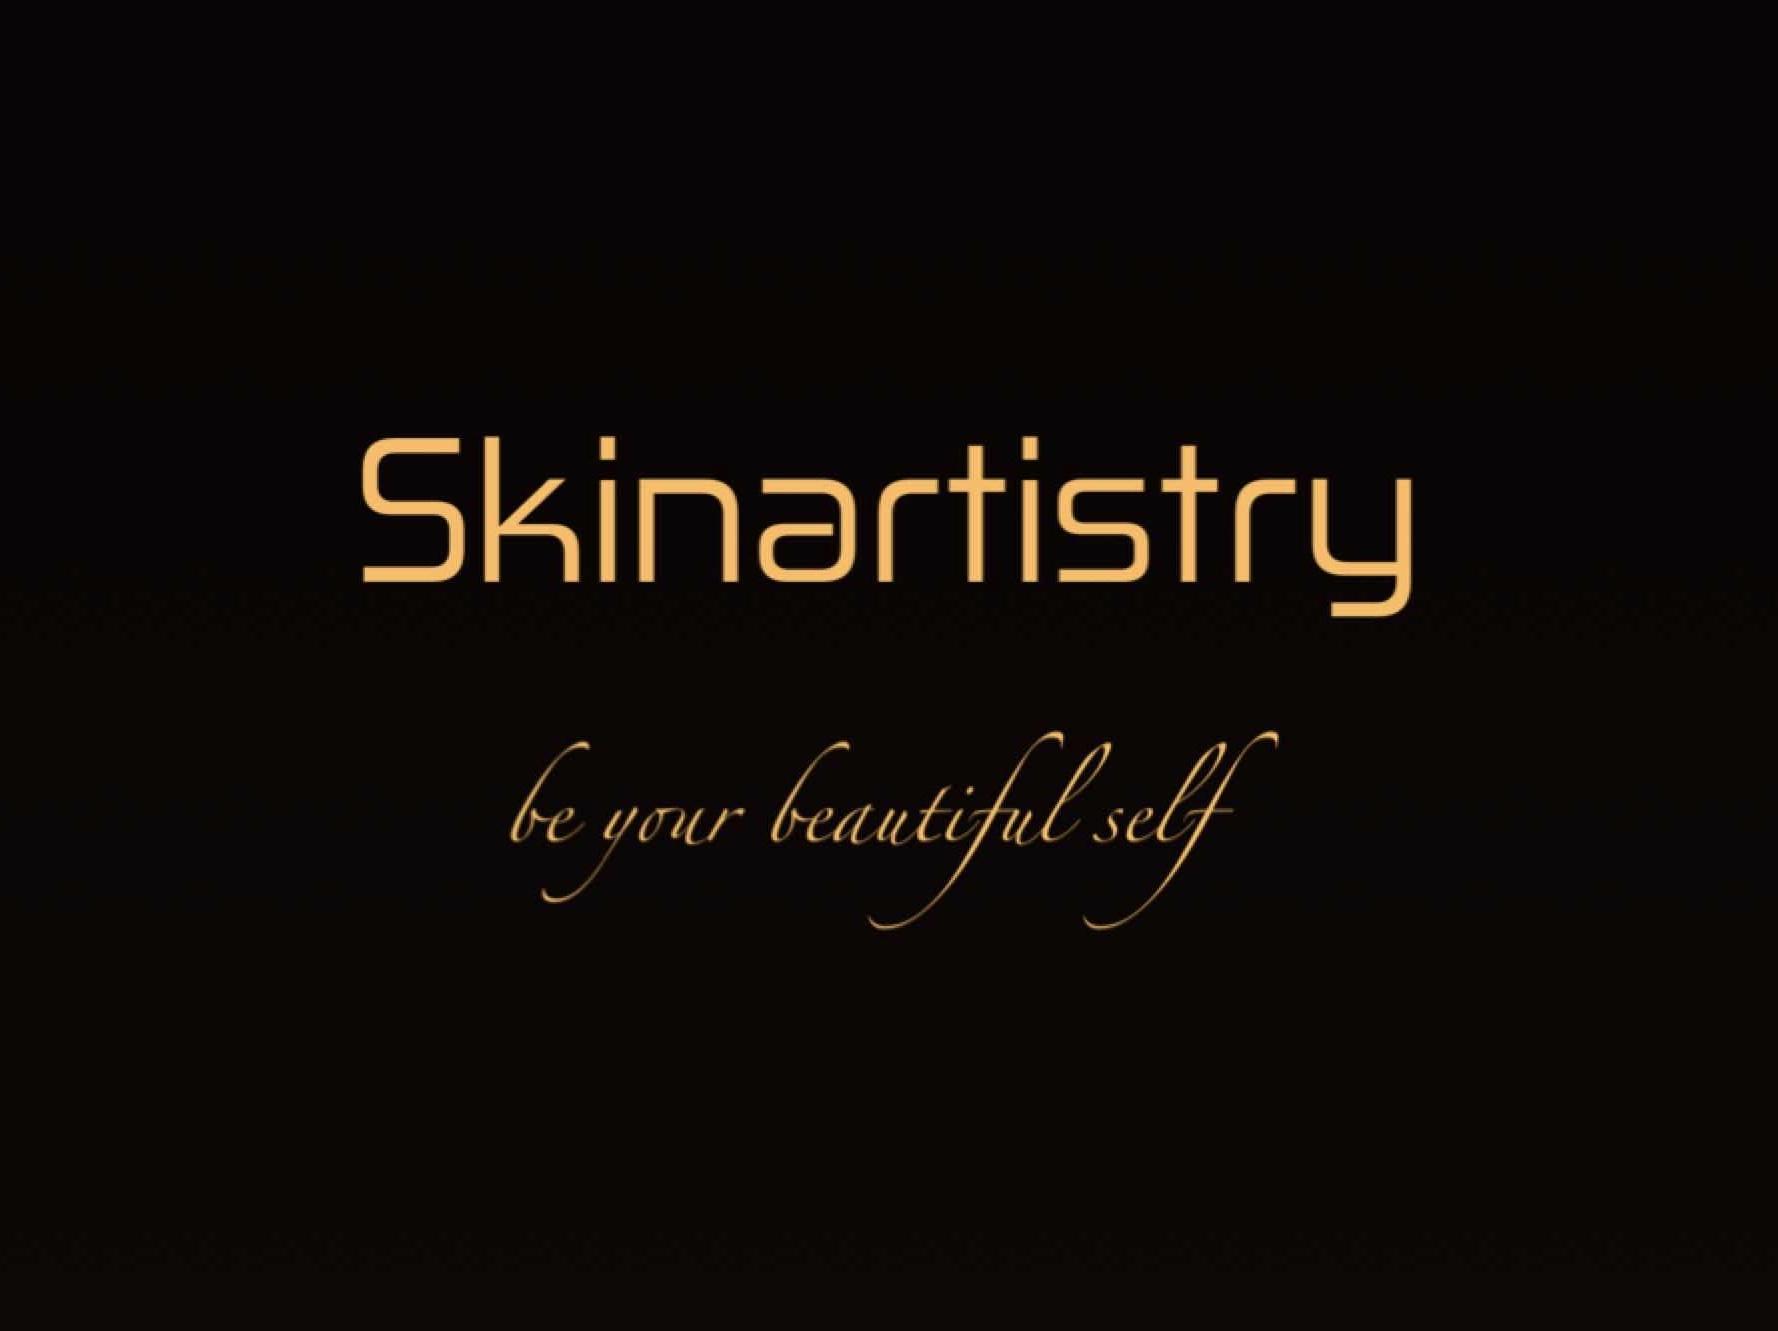 Praxis Institut Skinartistry